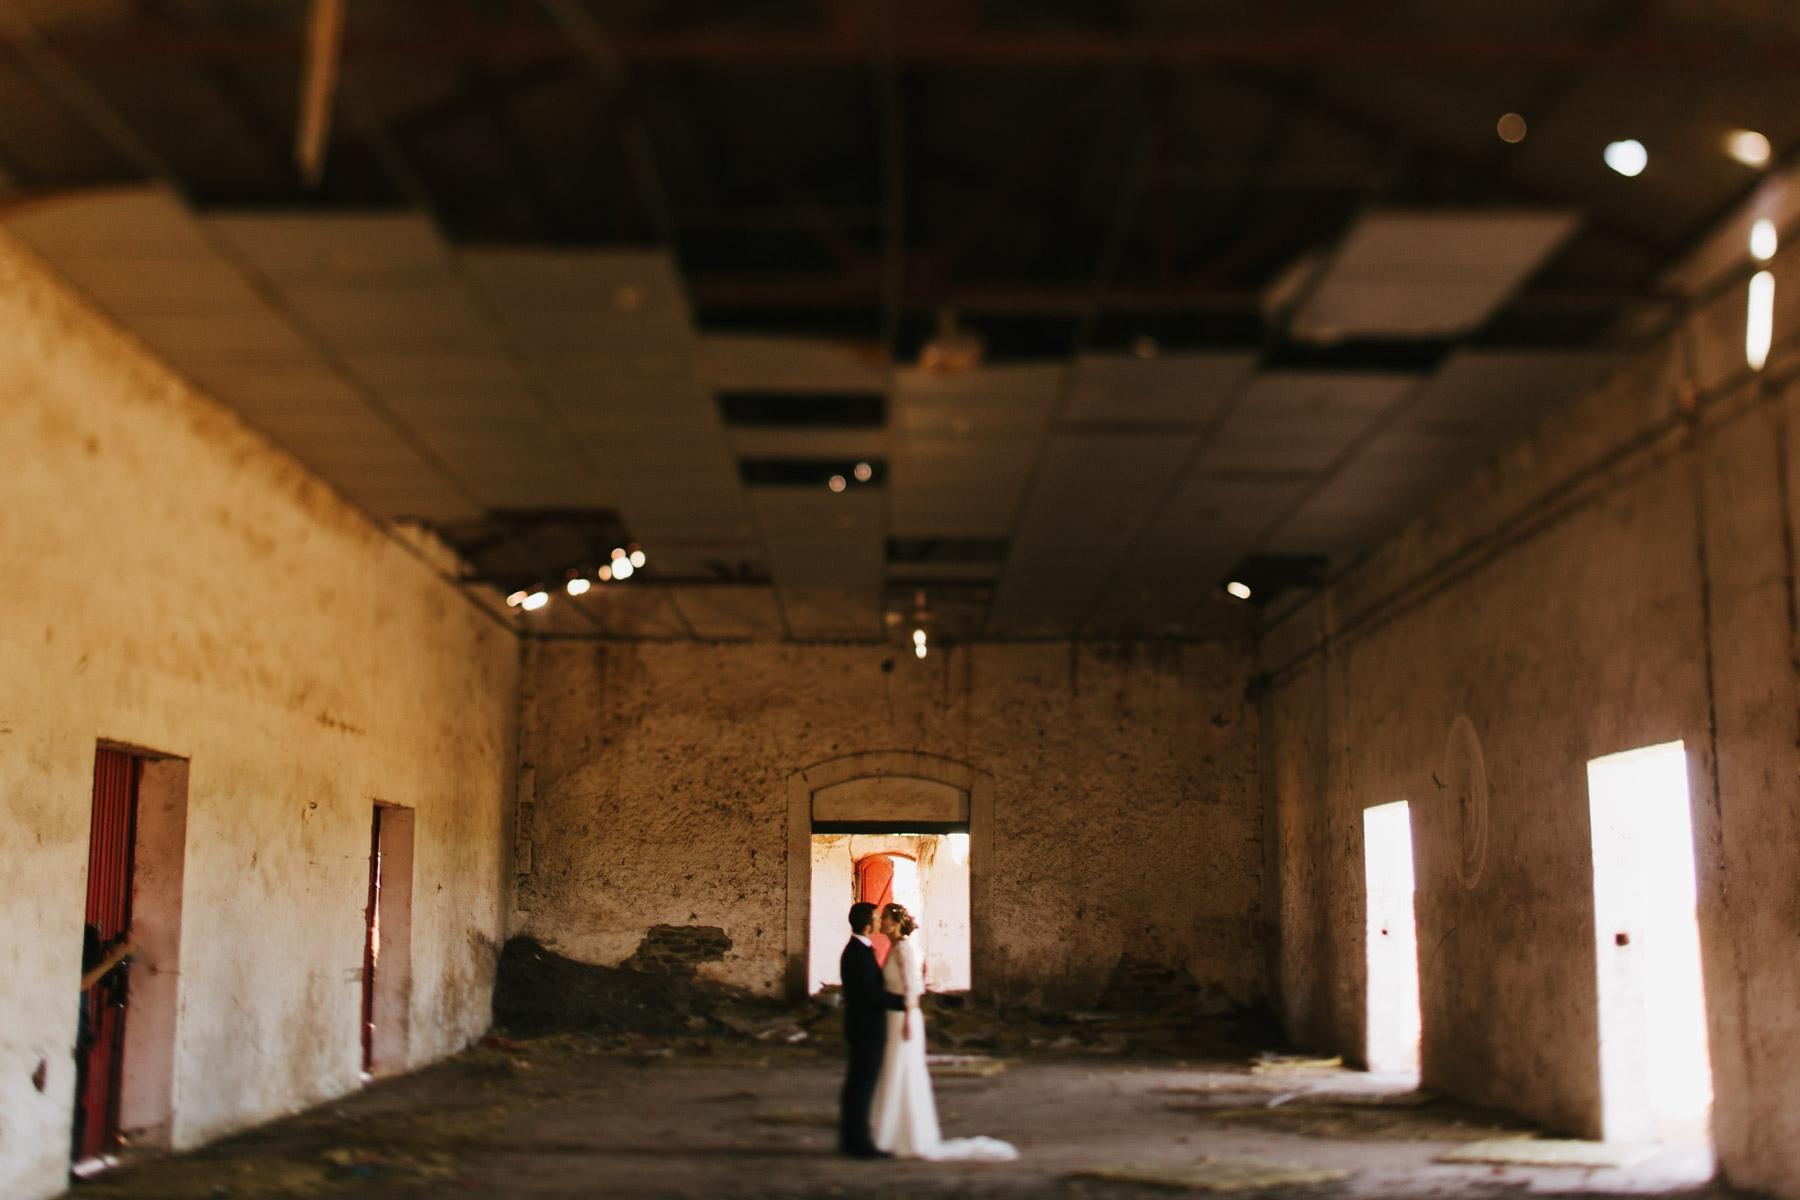 fotografo de bodas Jairo Crena-266